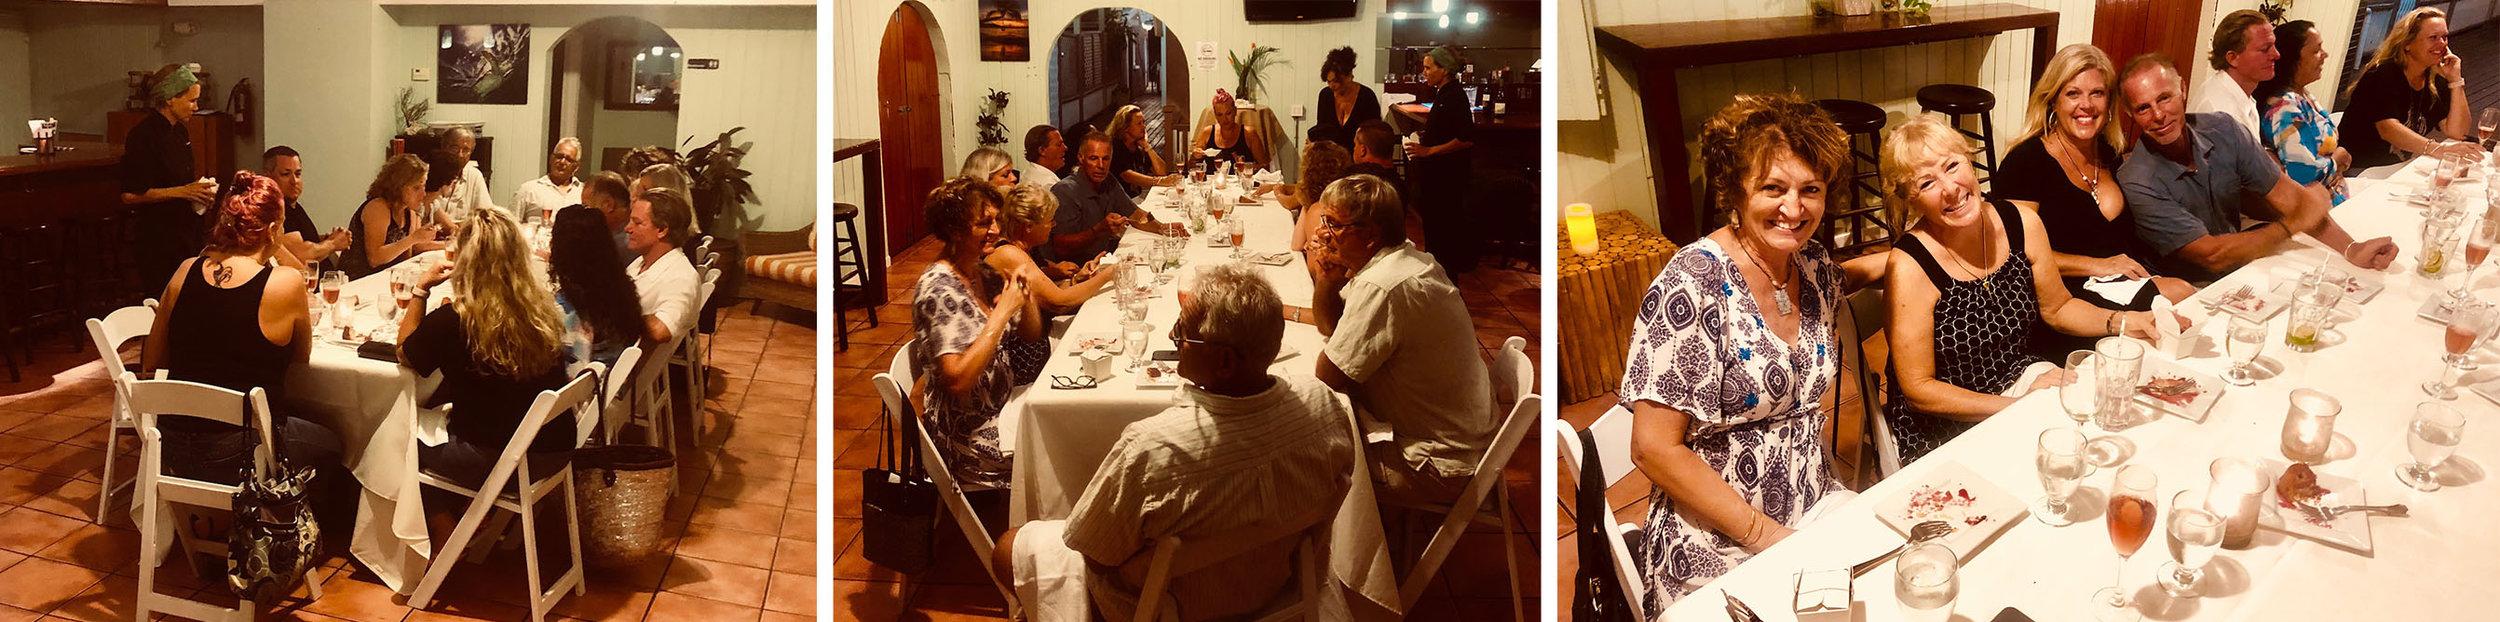 diner guests.jpg